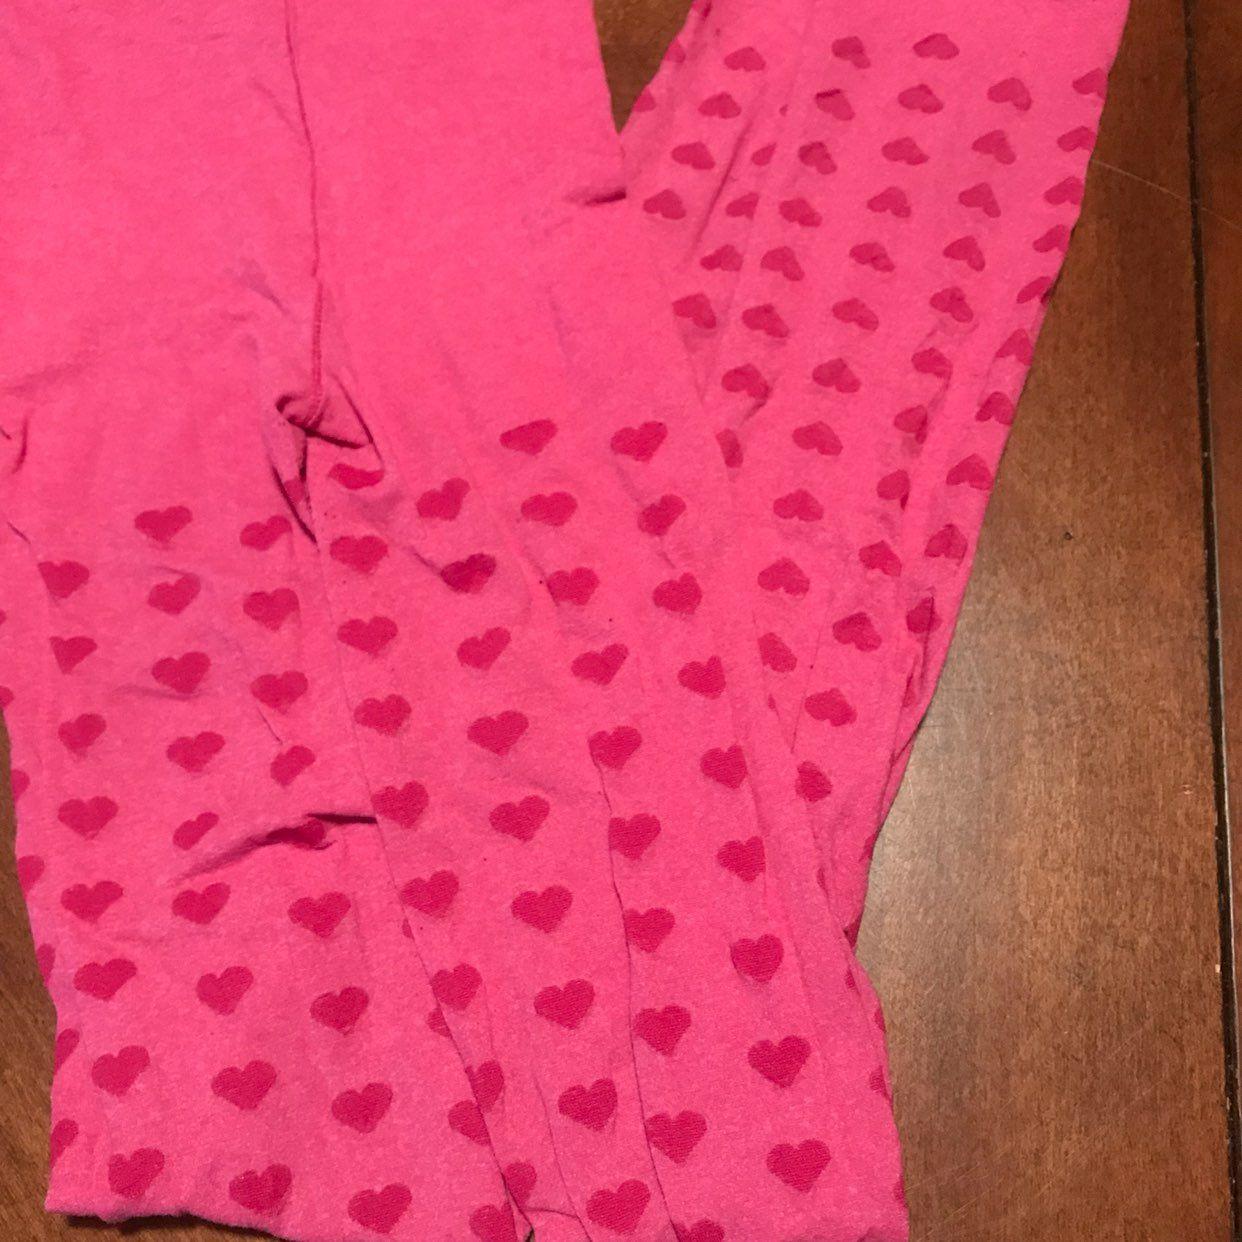 Girl's Pink Heart Leggings Pantyhose